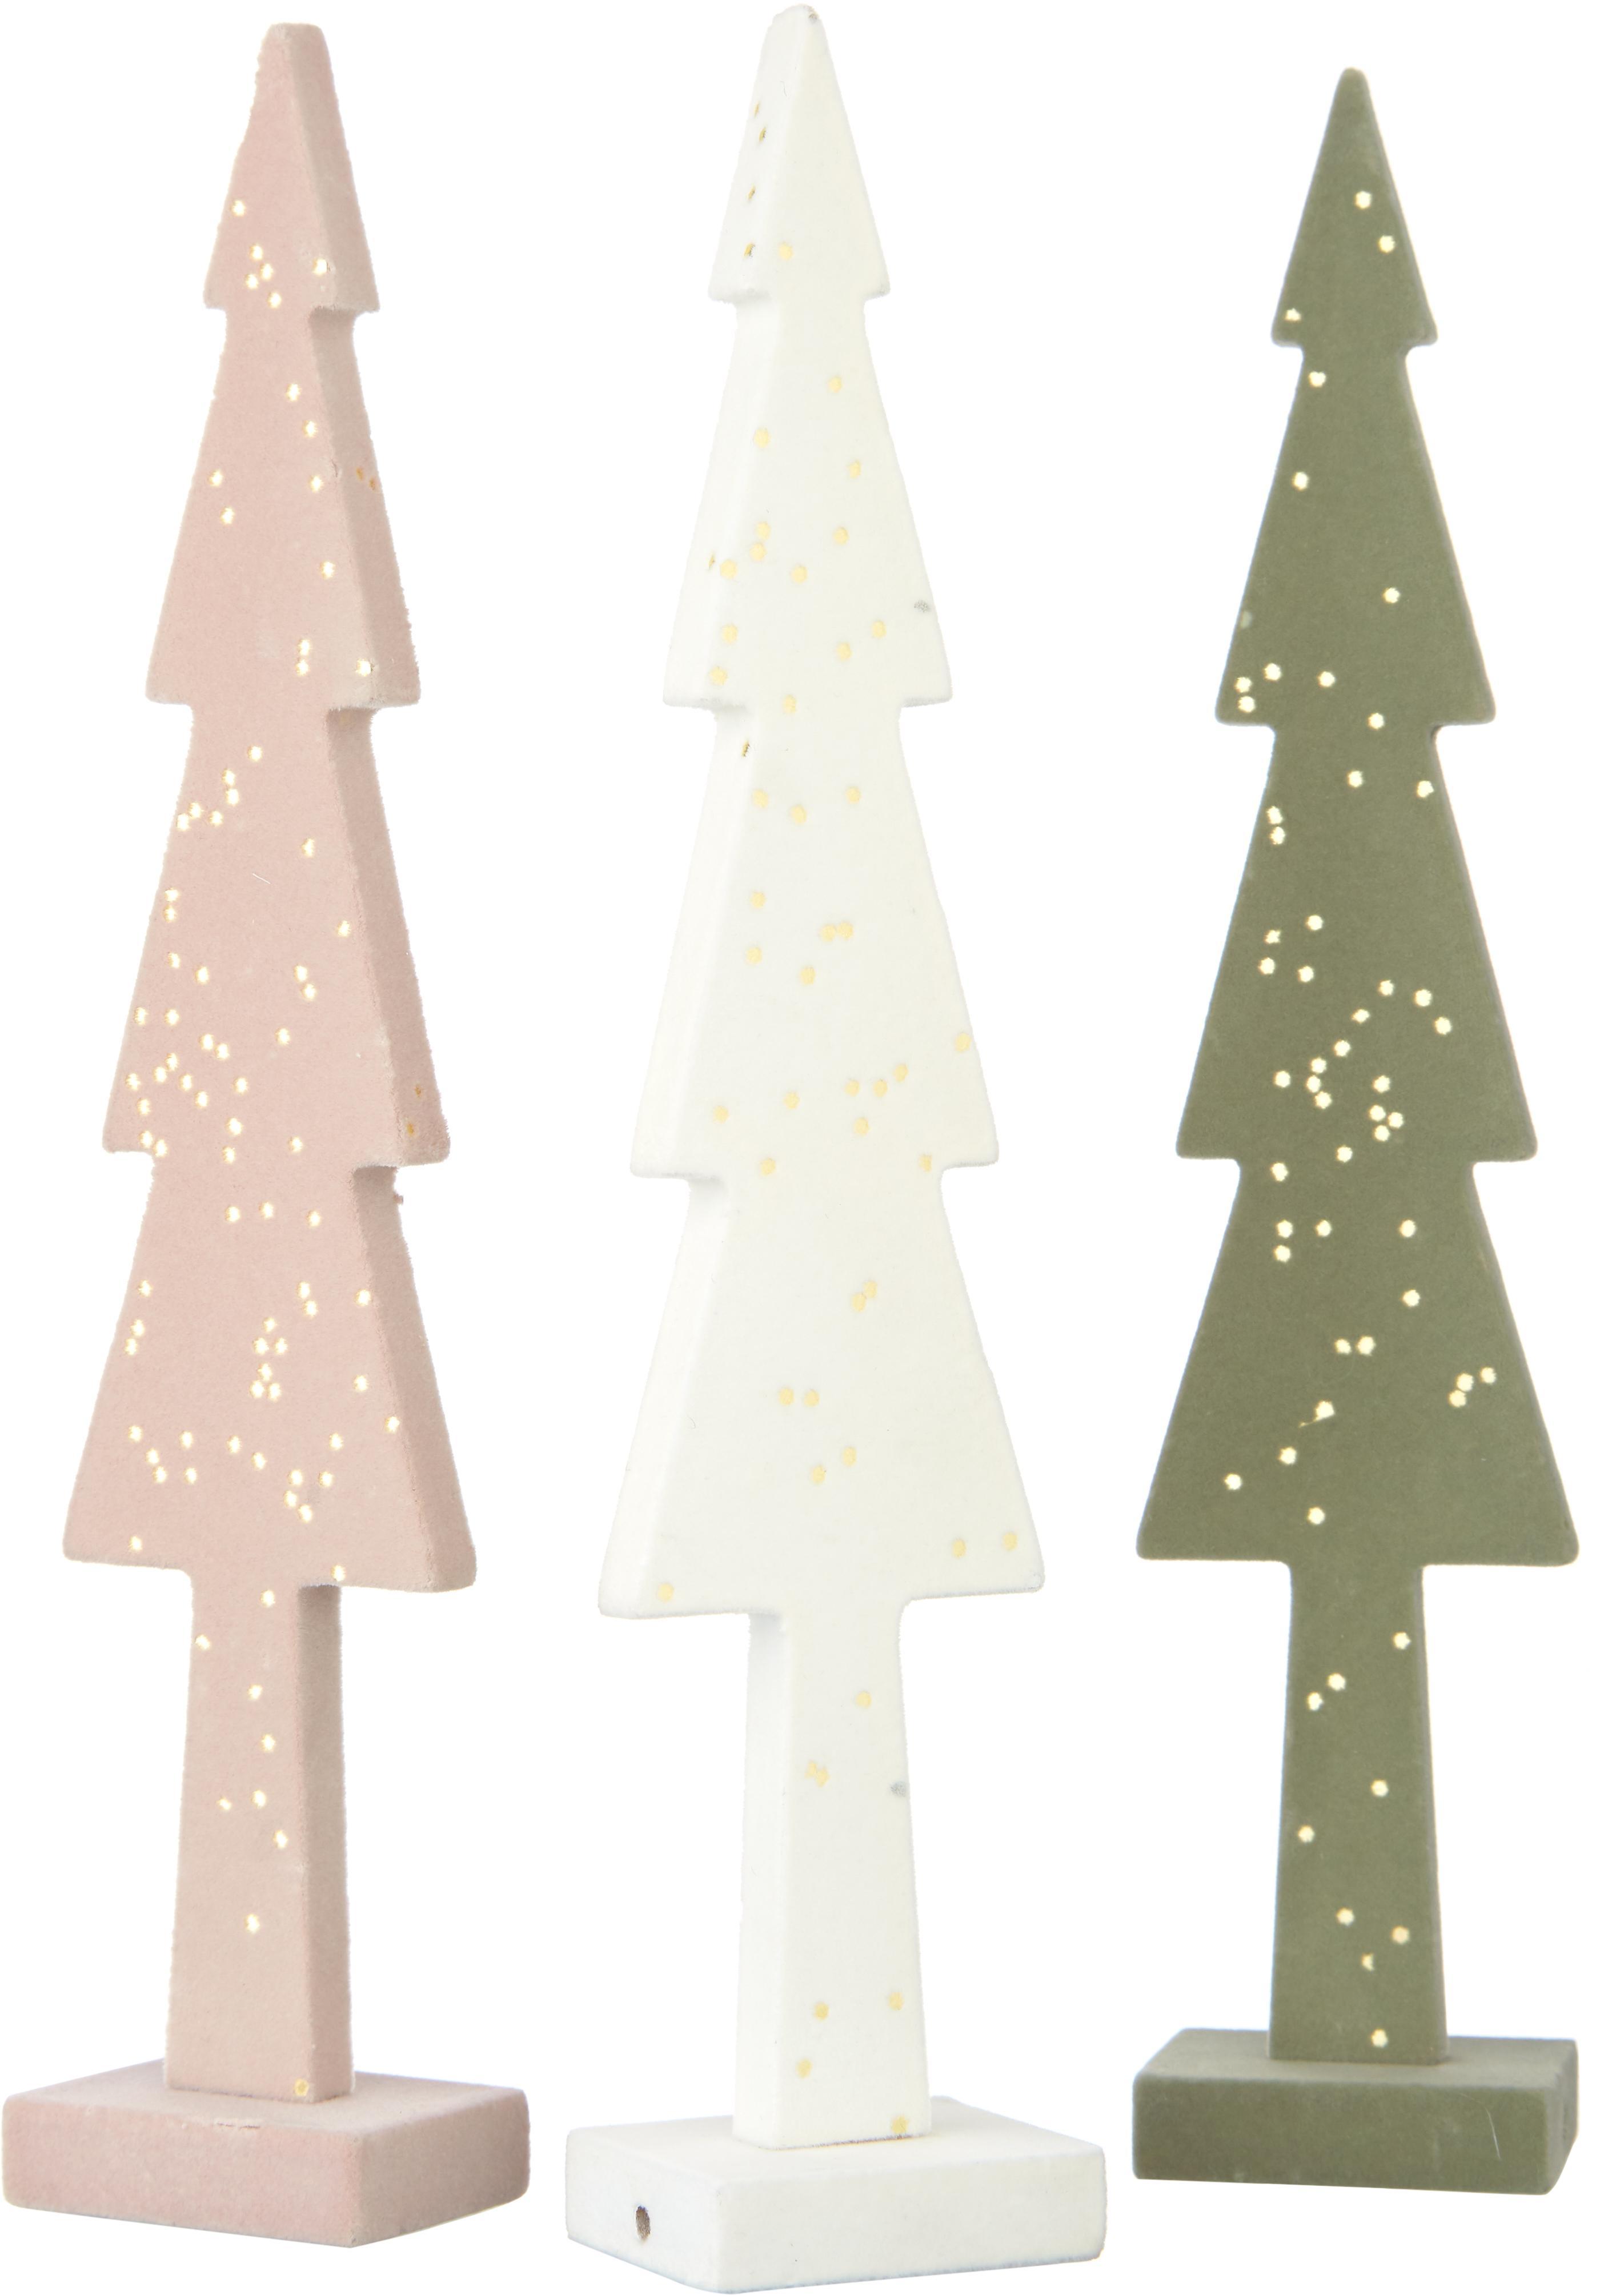 Decoratieve objectenset Pasti, 3-delig, MDF, textiel, Wit, lichtroze, groen, 5 x 27 cm